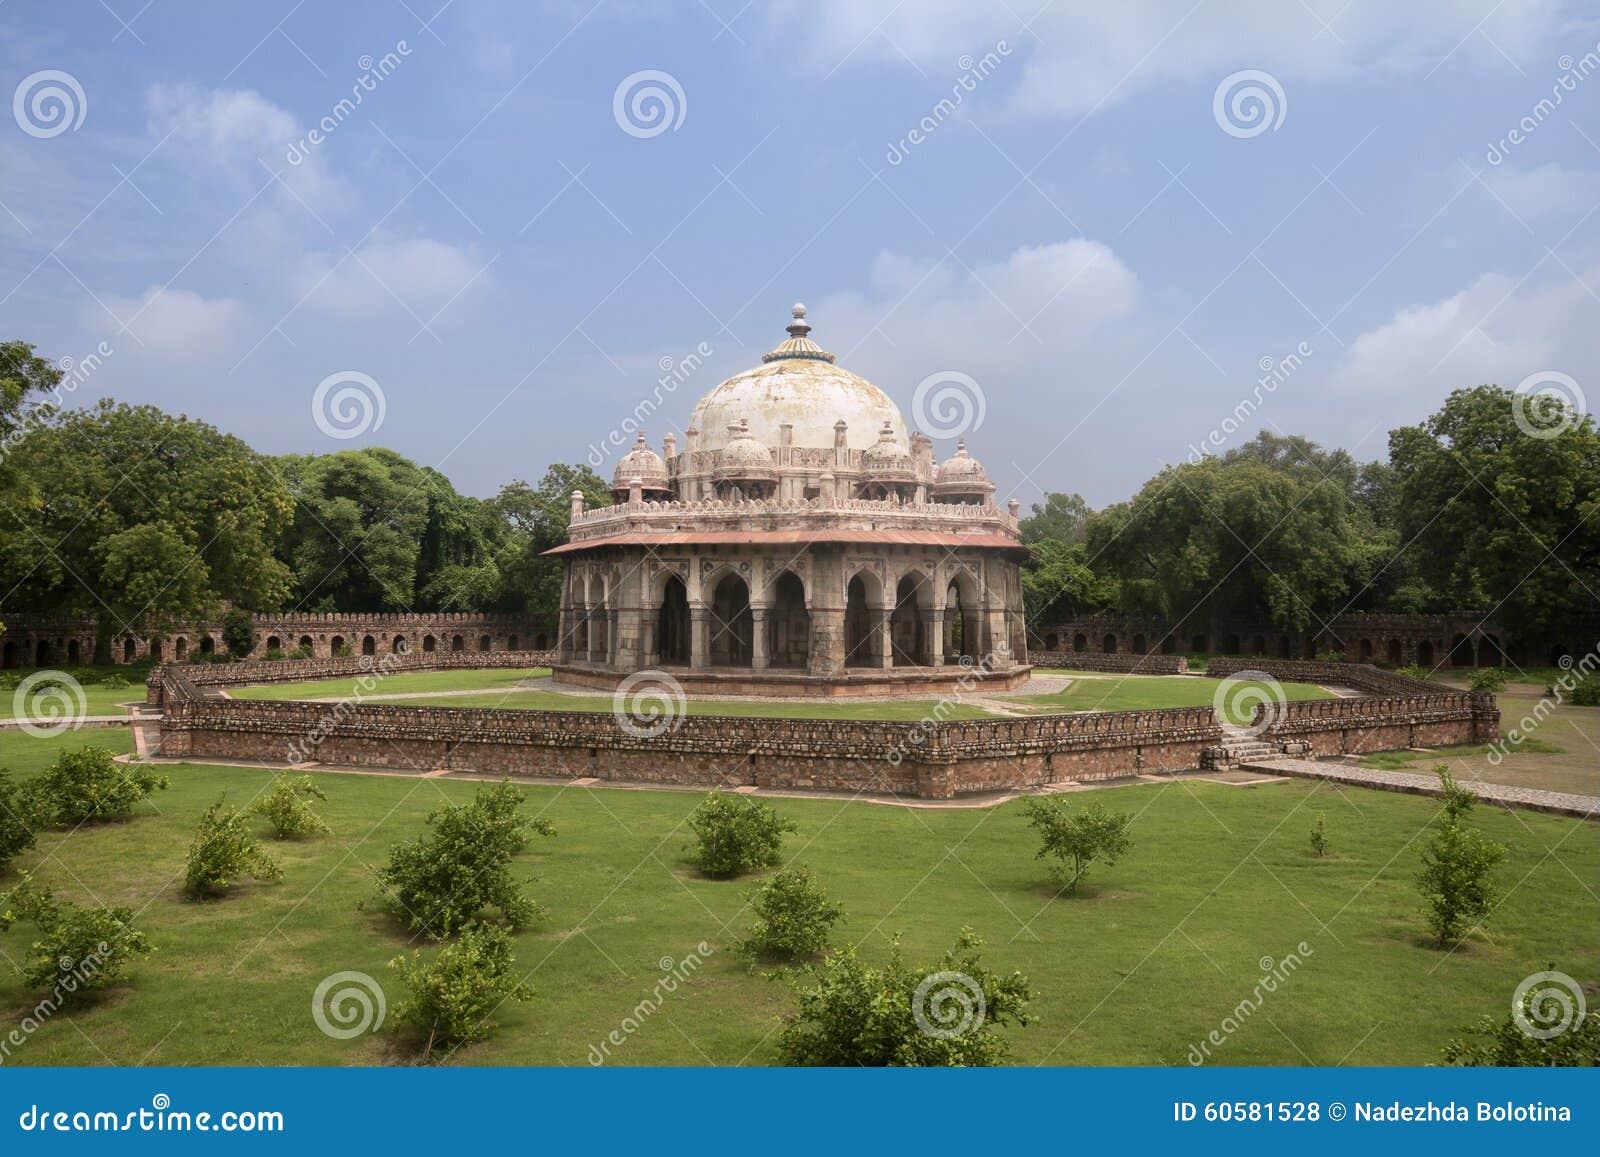 Túmulo do AIA Khan, Nova Deli India